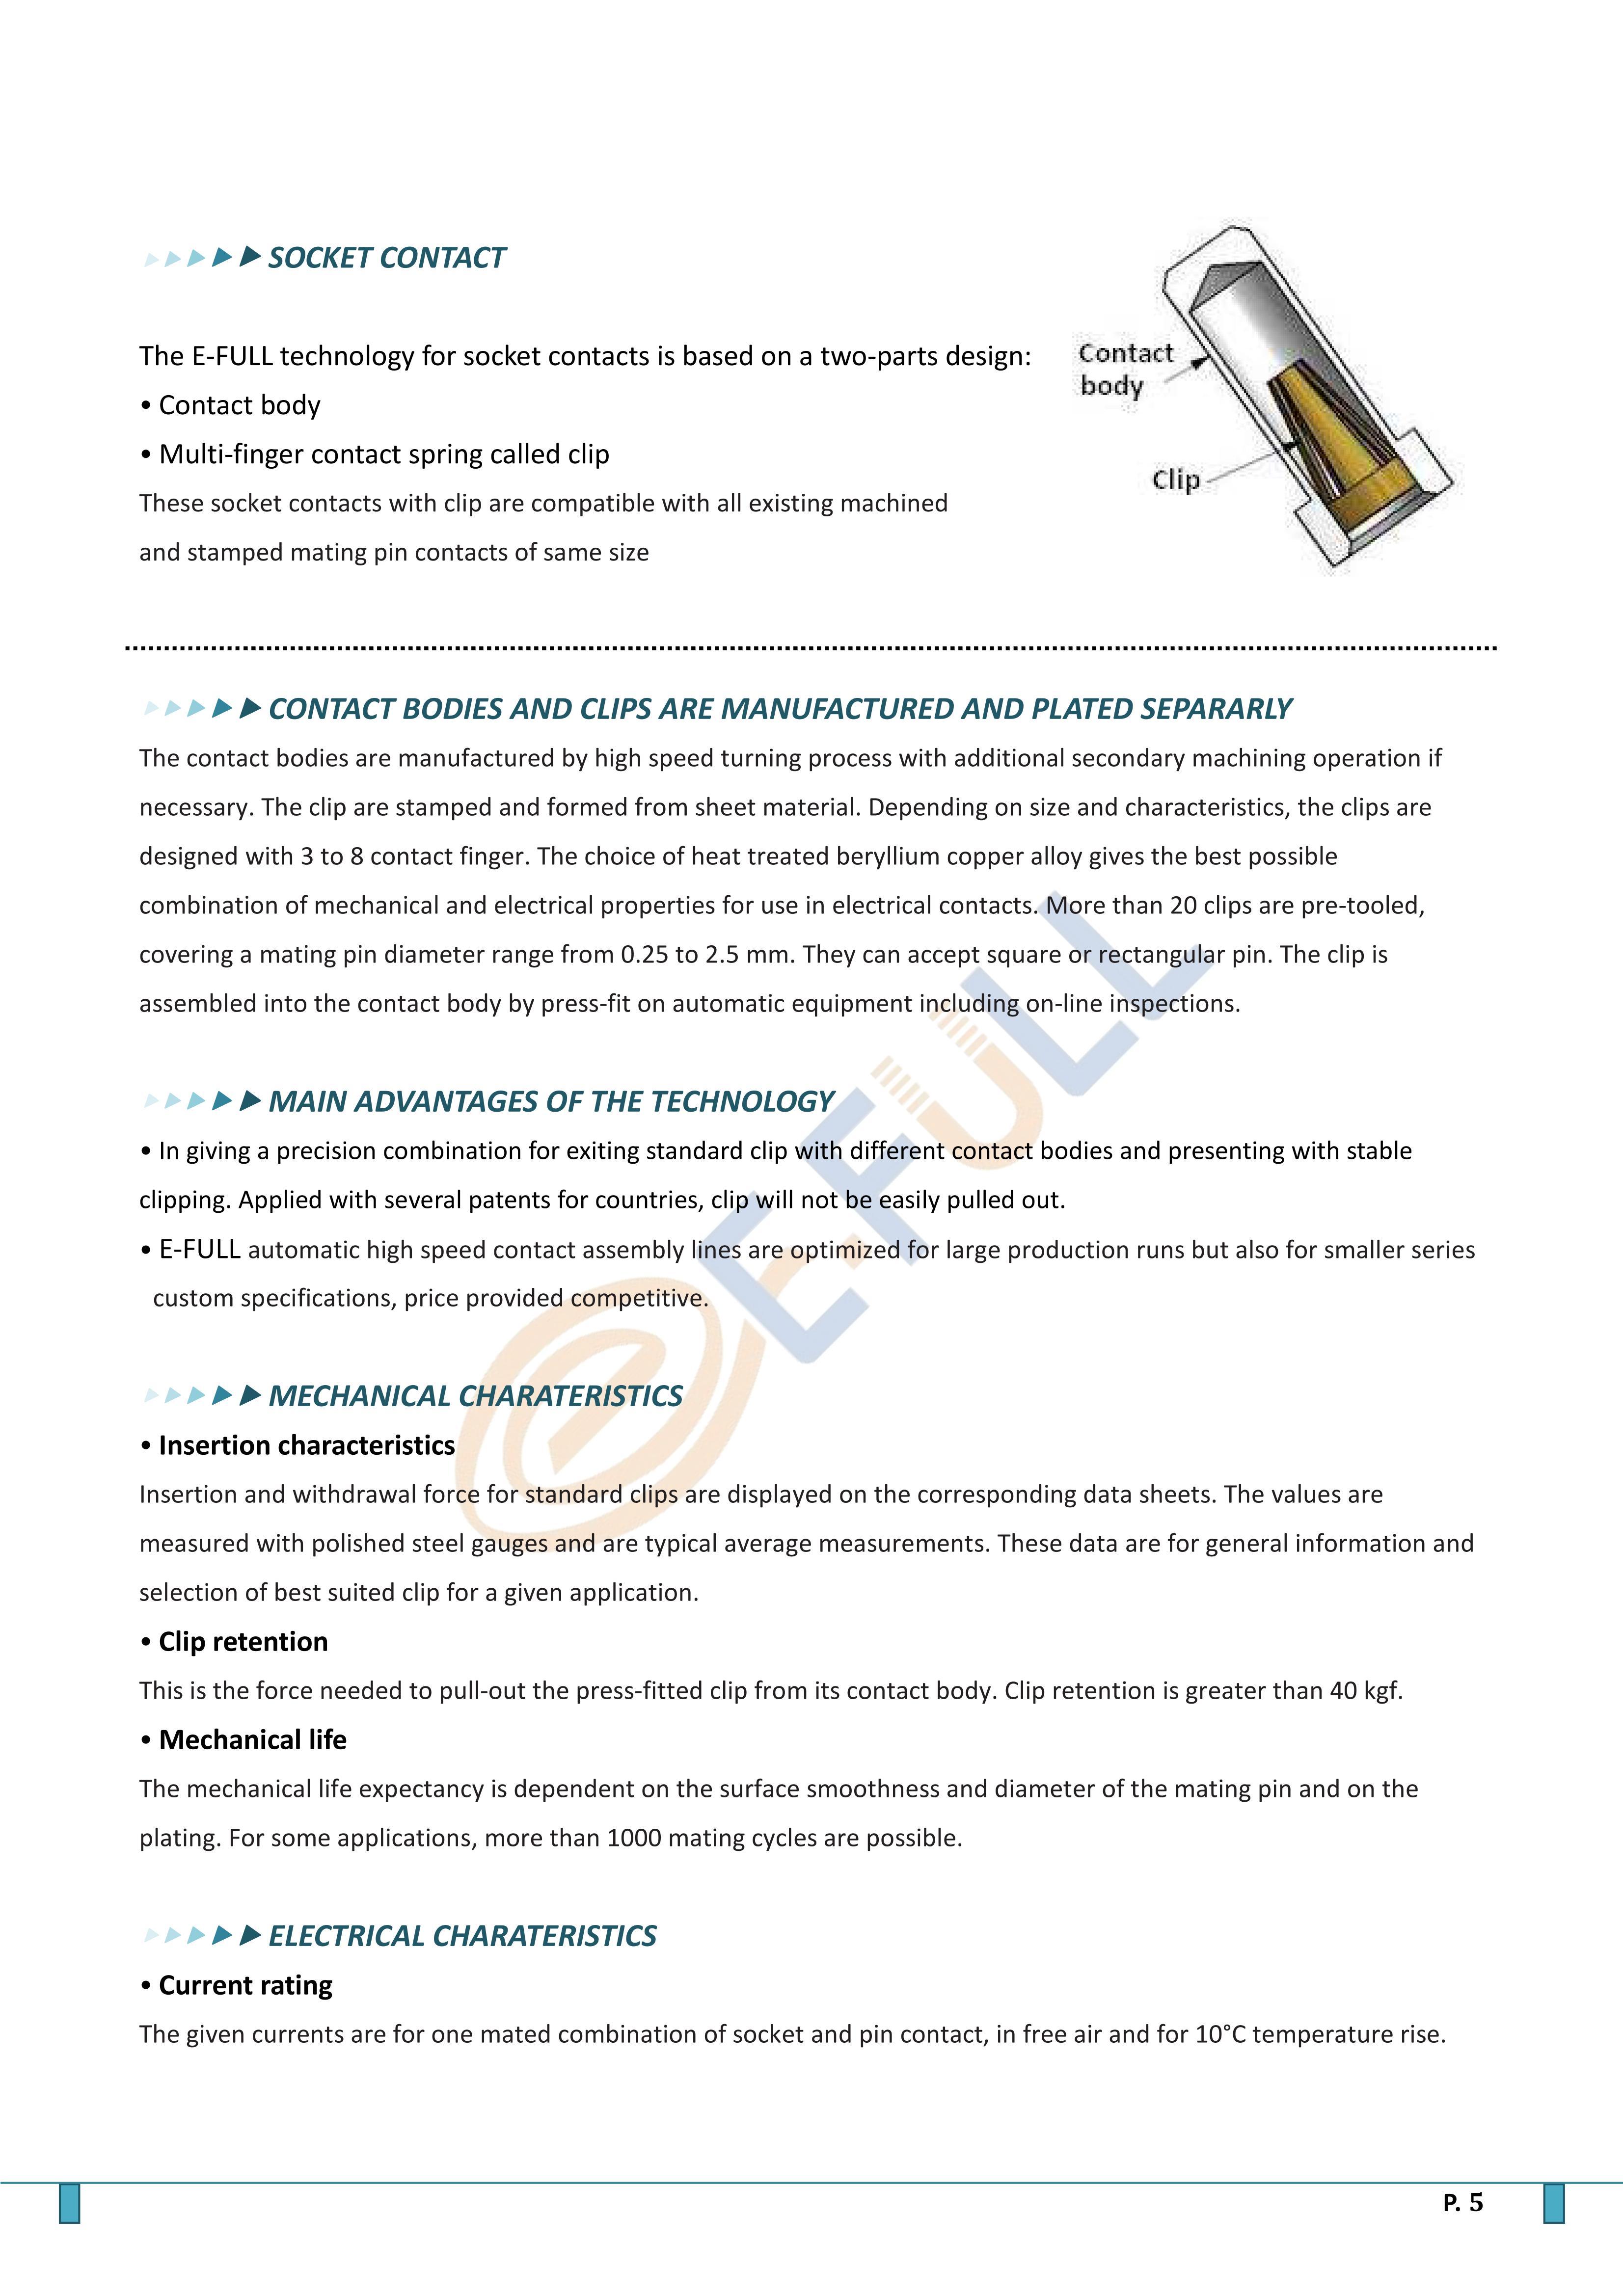 Pin contact (Male PCB pin)